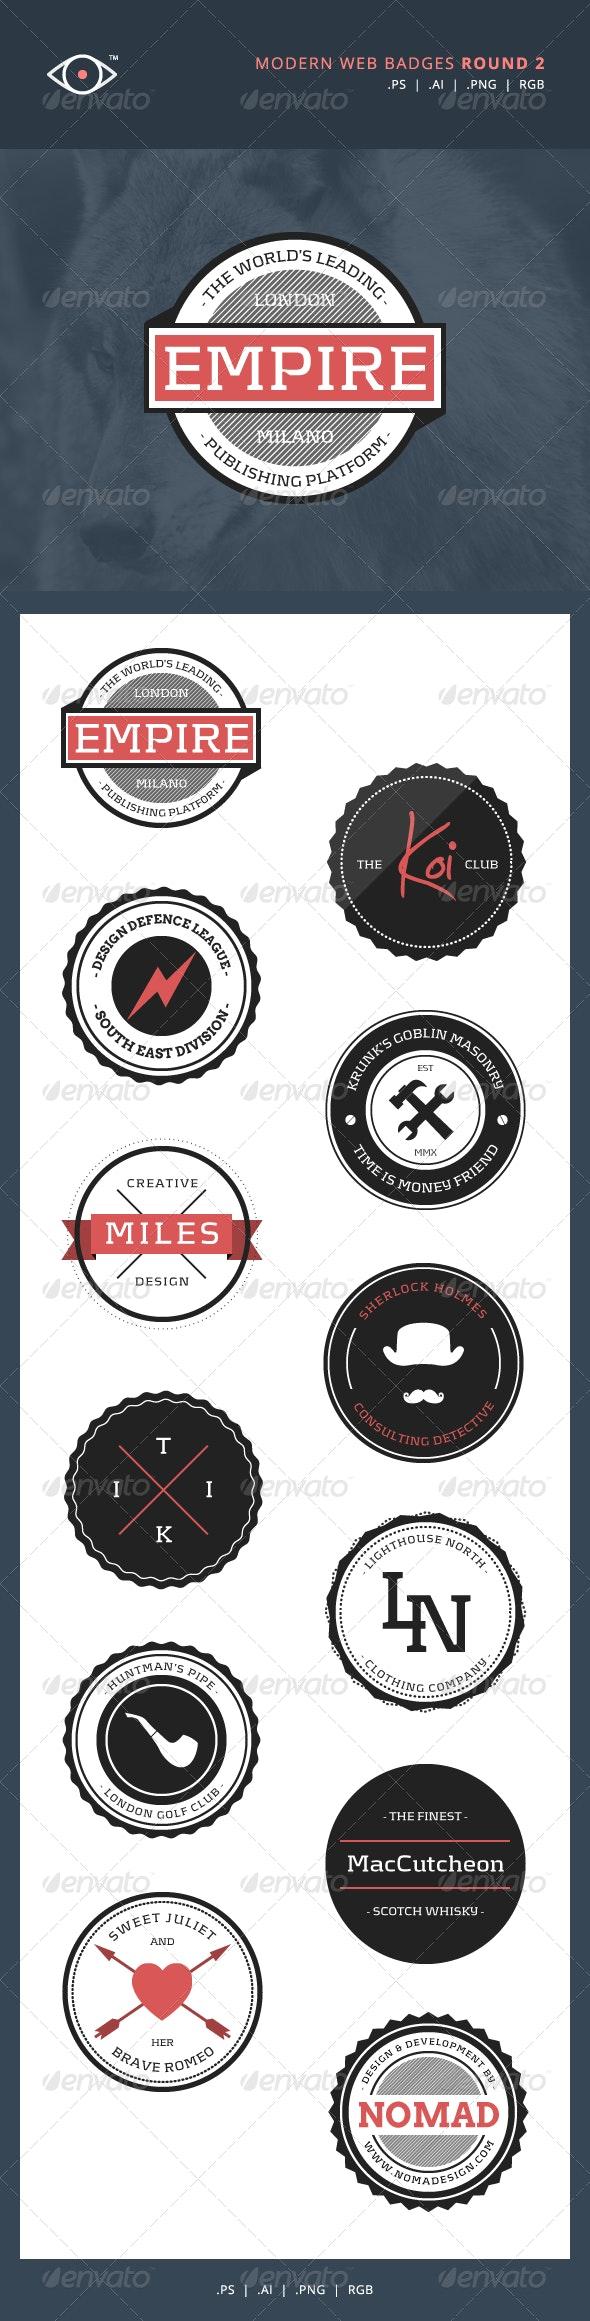 Modern Web Badges - Round 2 - Badges & Stickers Web Elements